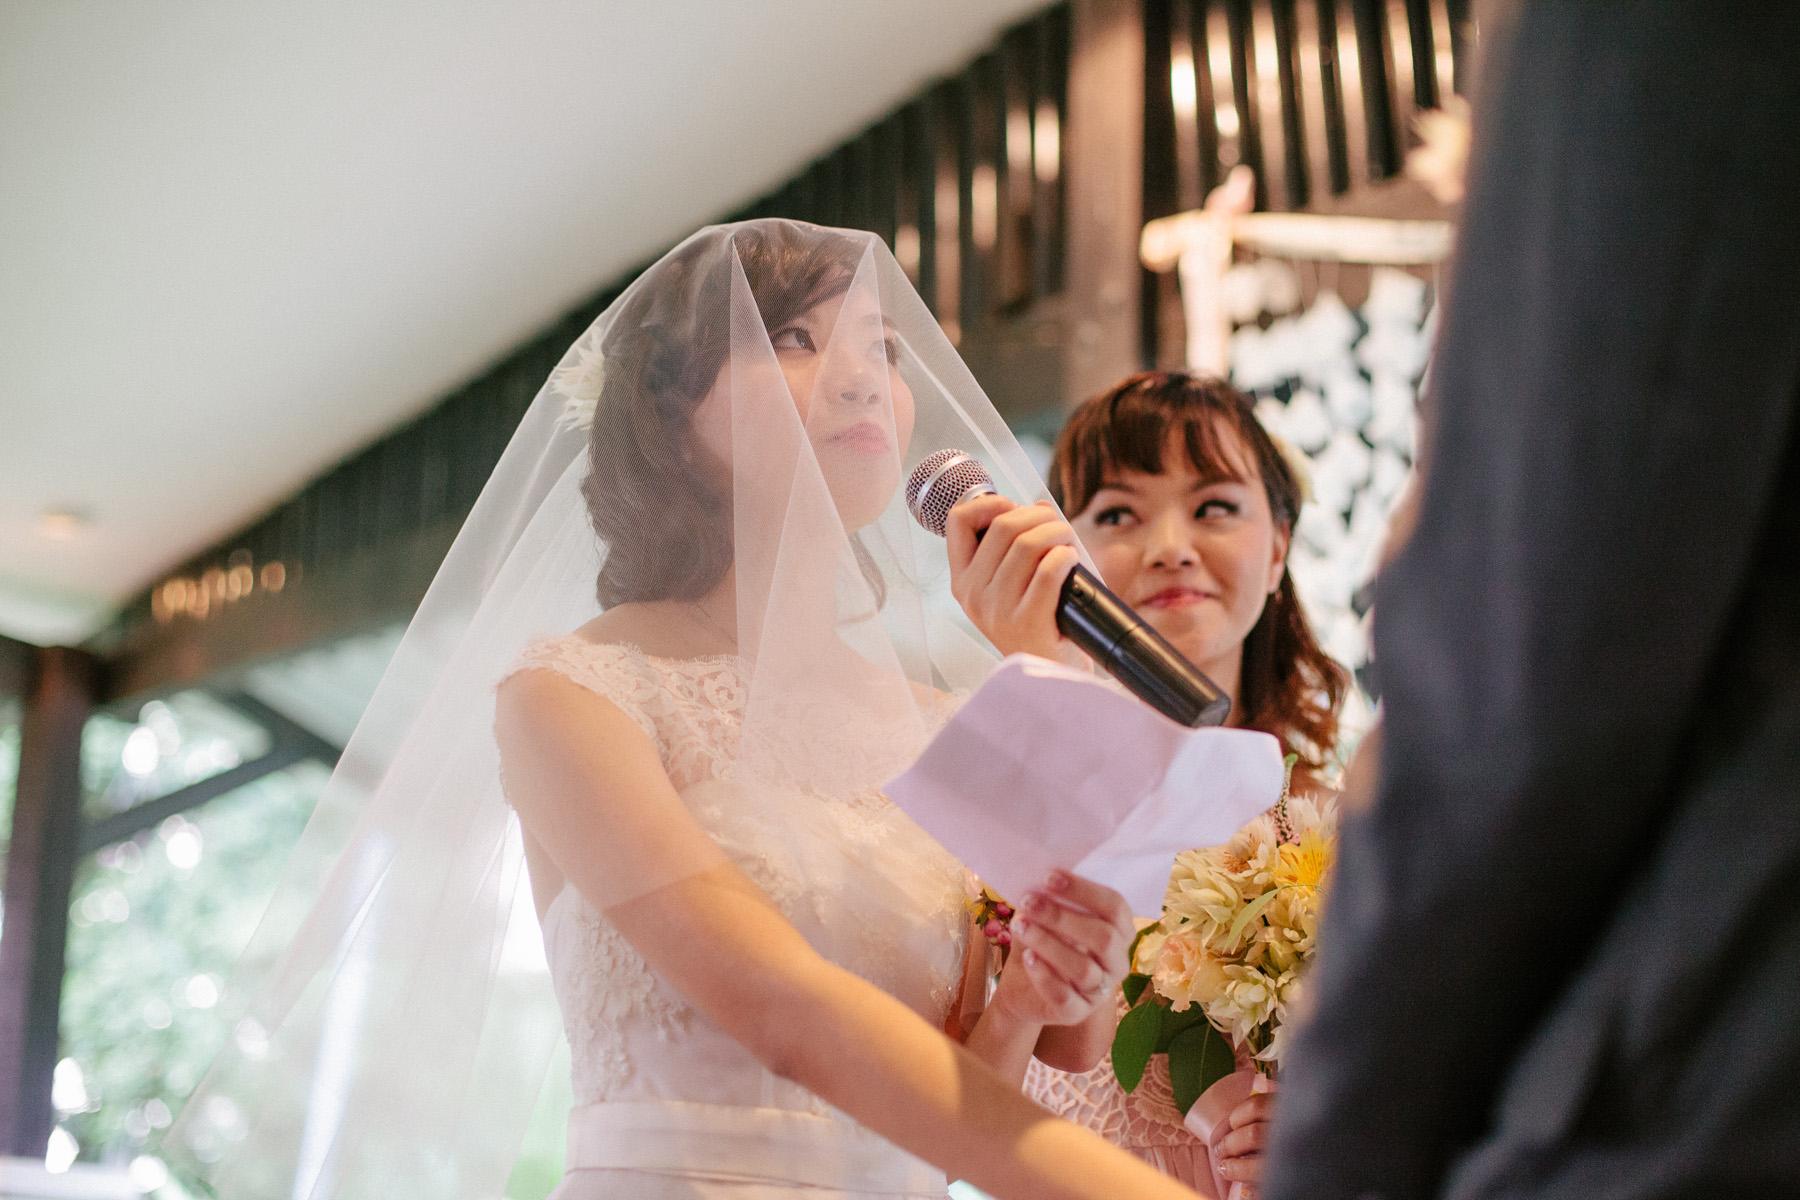 singapore-wedding-travel-photographer-faith-alvin-wedding-wmt-40.jpg